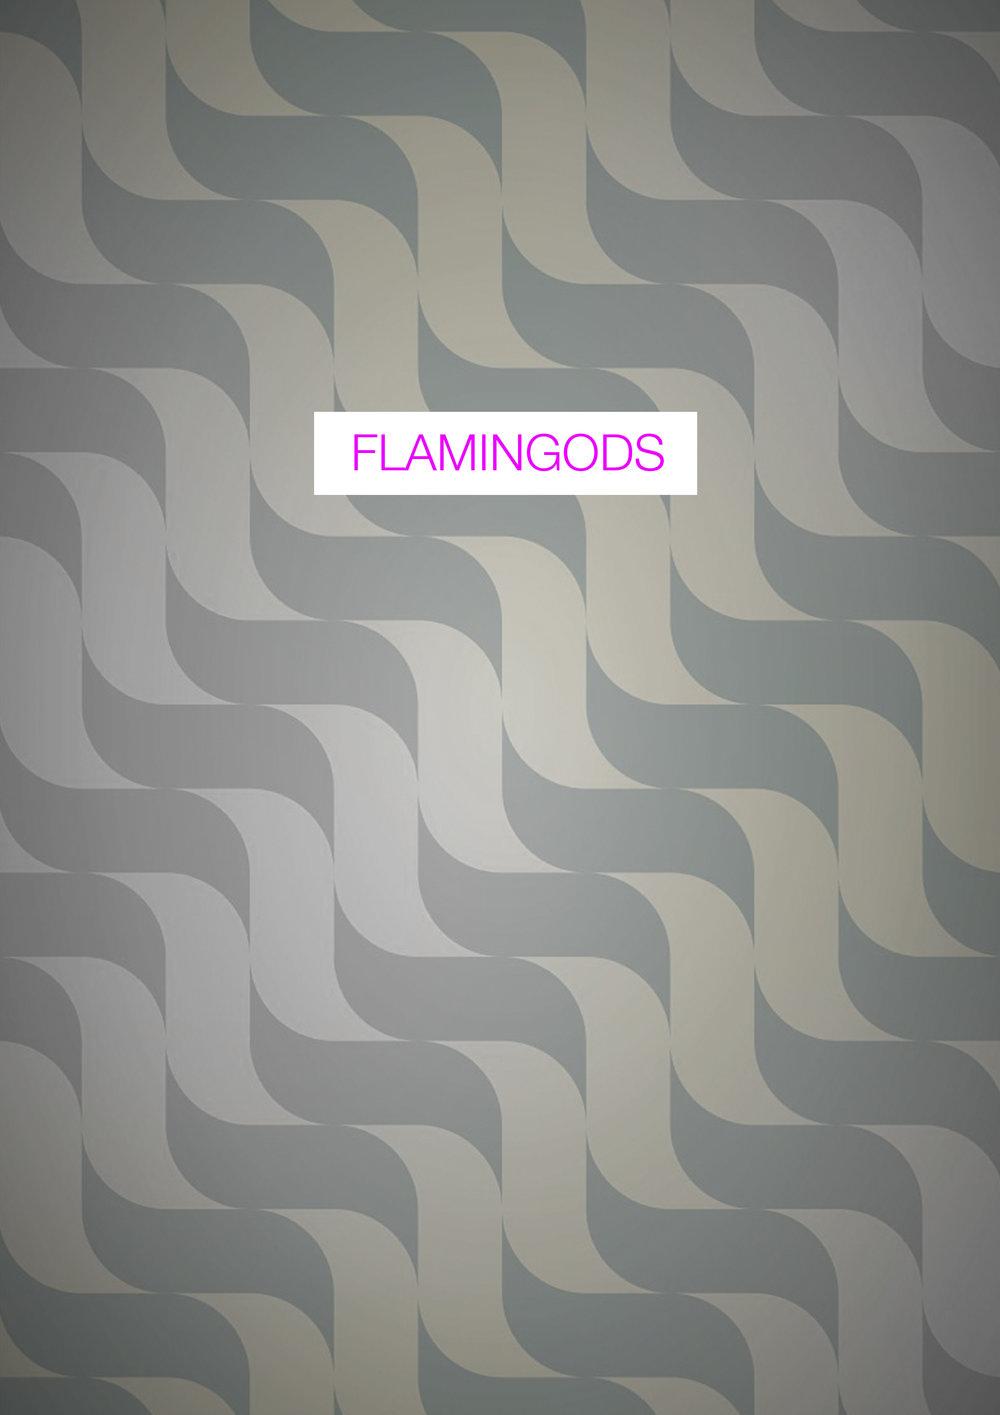 flamingods graphics.jpg